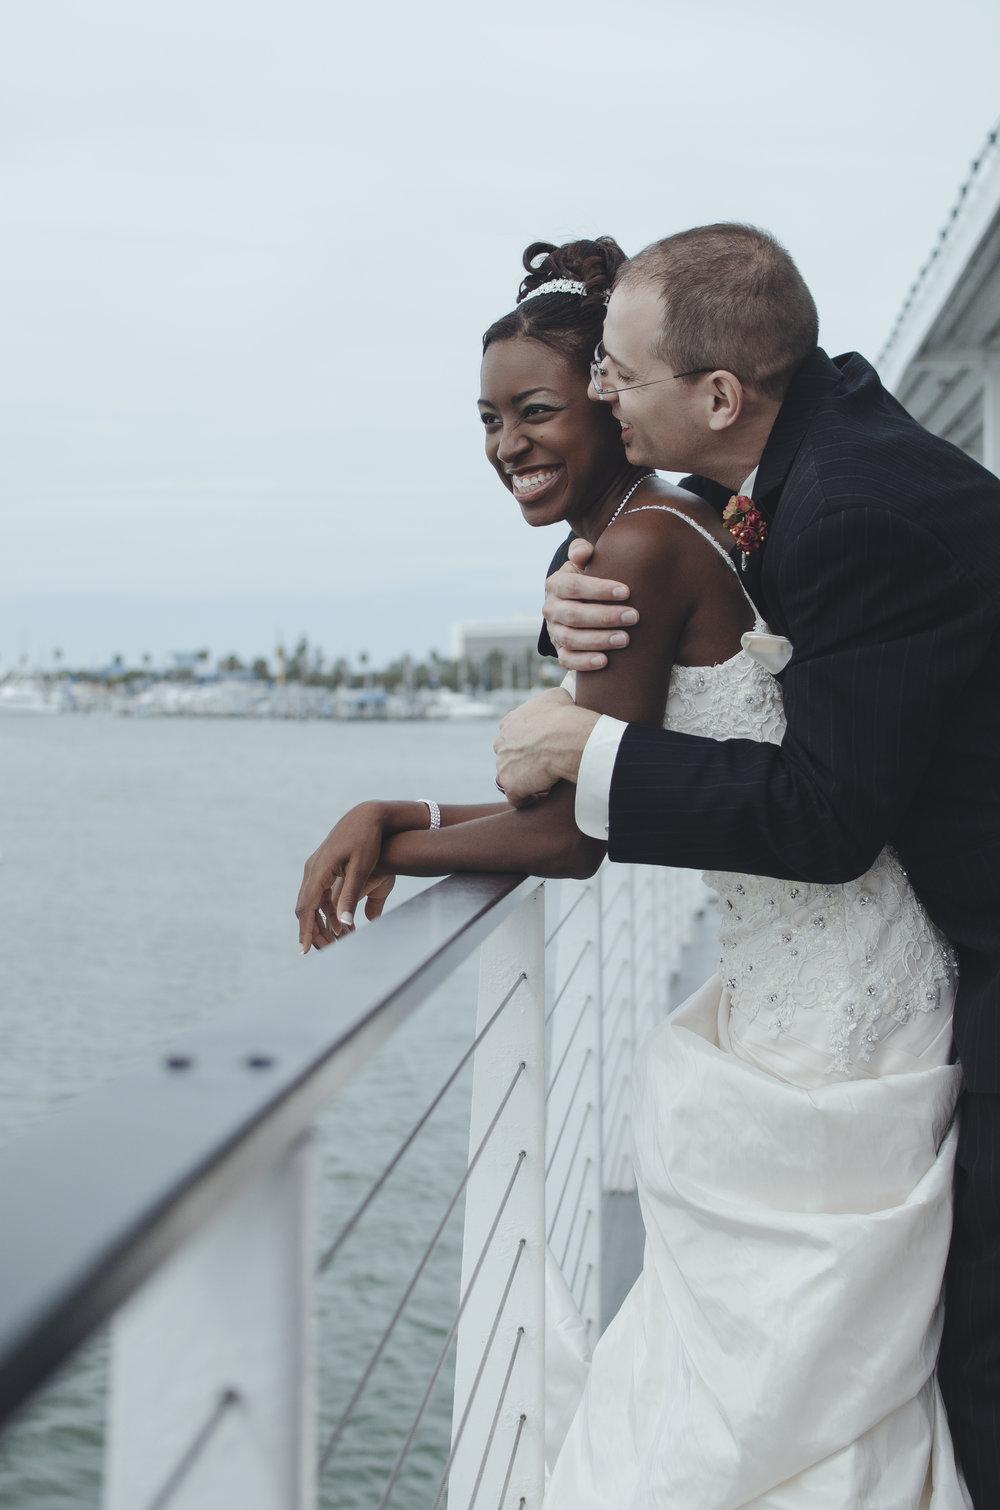 Nancy & Joseph - Shipboard Tampa Destination Wedding by Kelsie Taylor